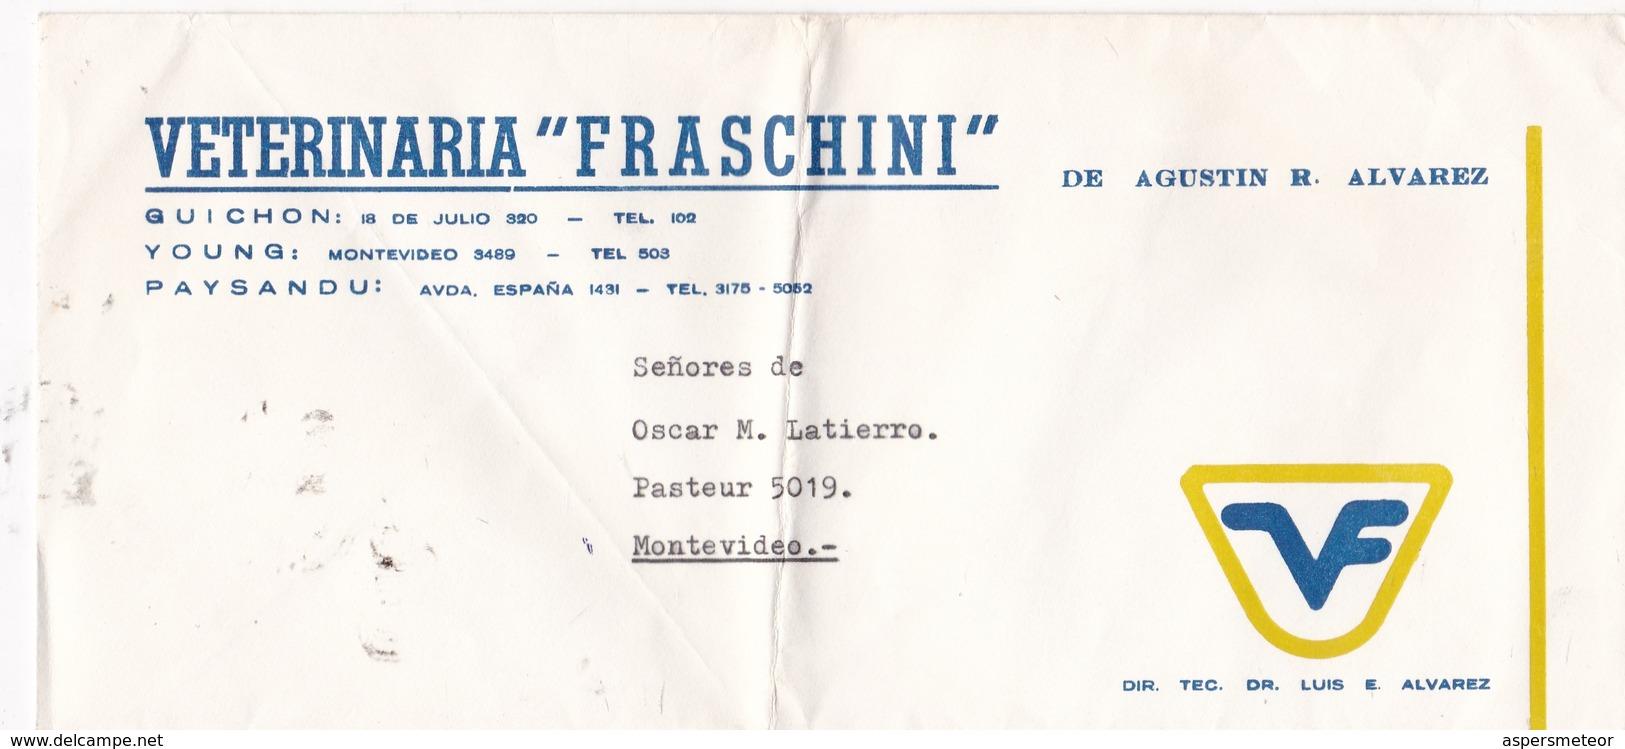 VETERINARIA FRASCHINI - COMMERCIAL ENVELOPE CIRCULEE CIRCA 1980s URUGUAY - BLEUP - Uruguay